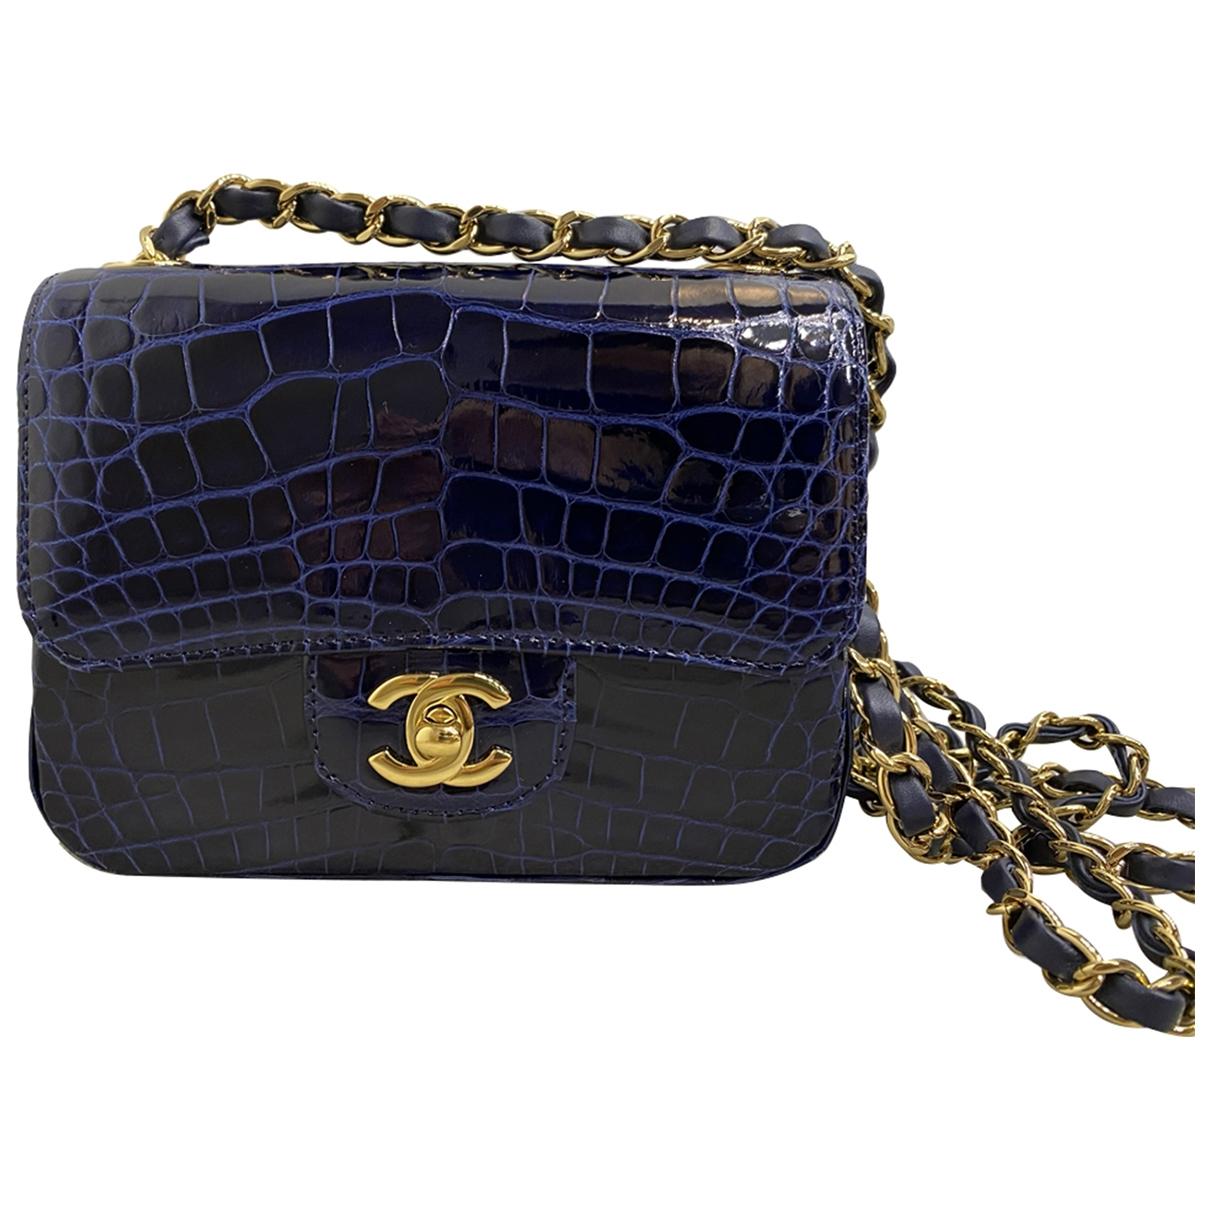 Chanel Timeless/Classique Handtasche in  Marine Aligator